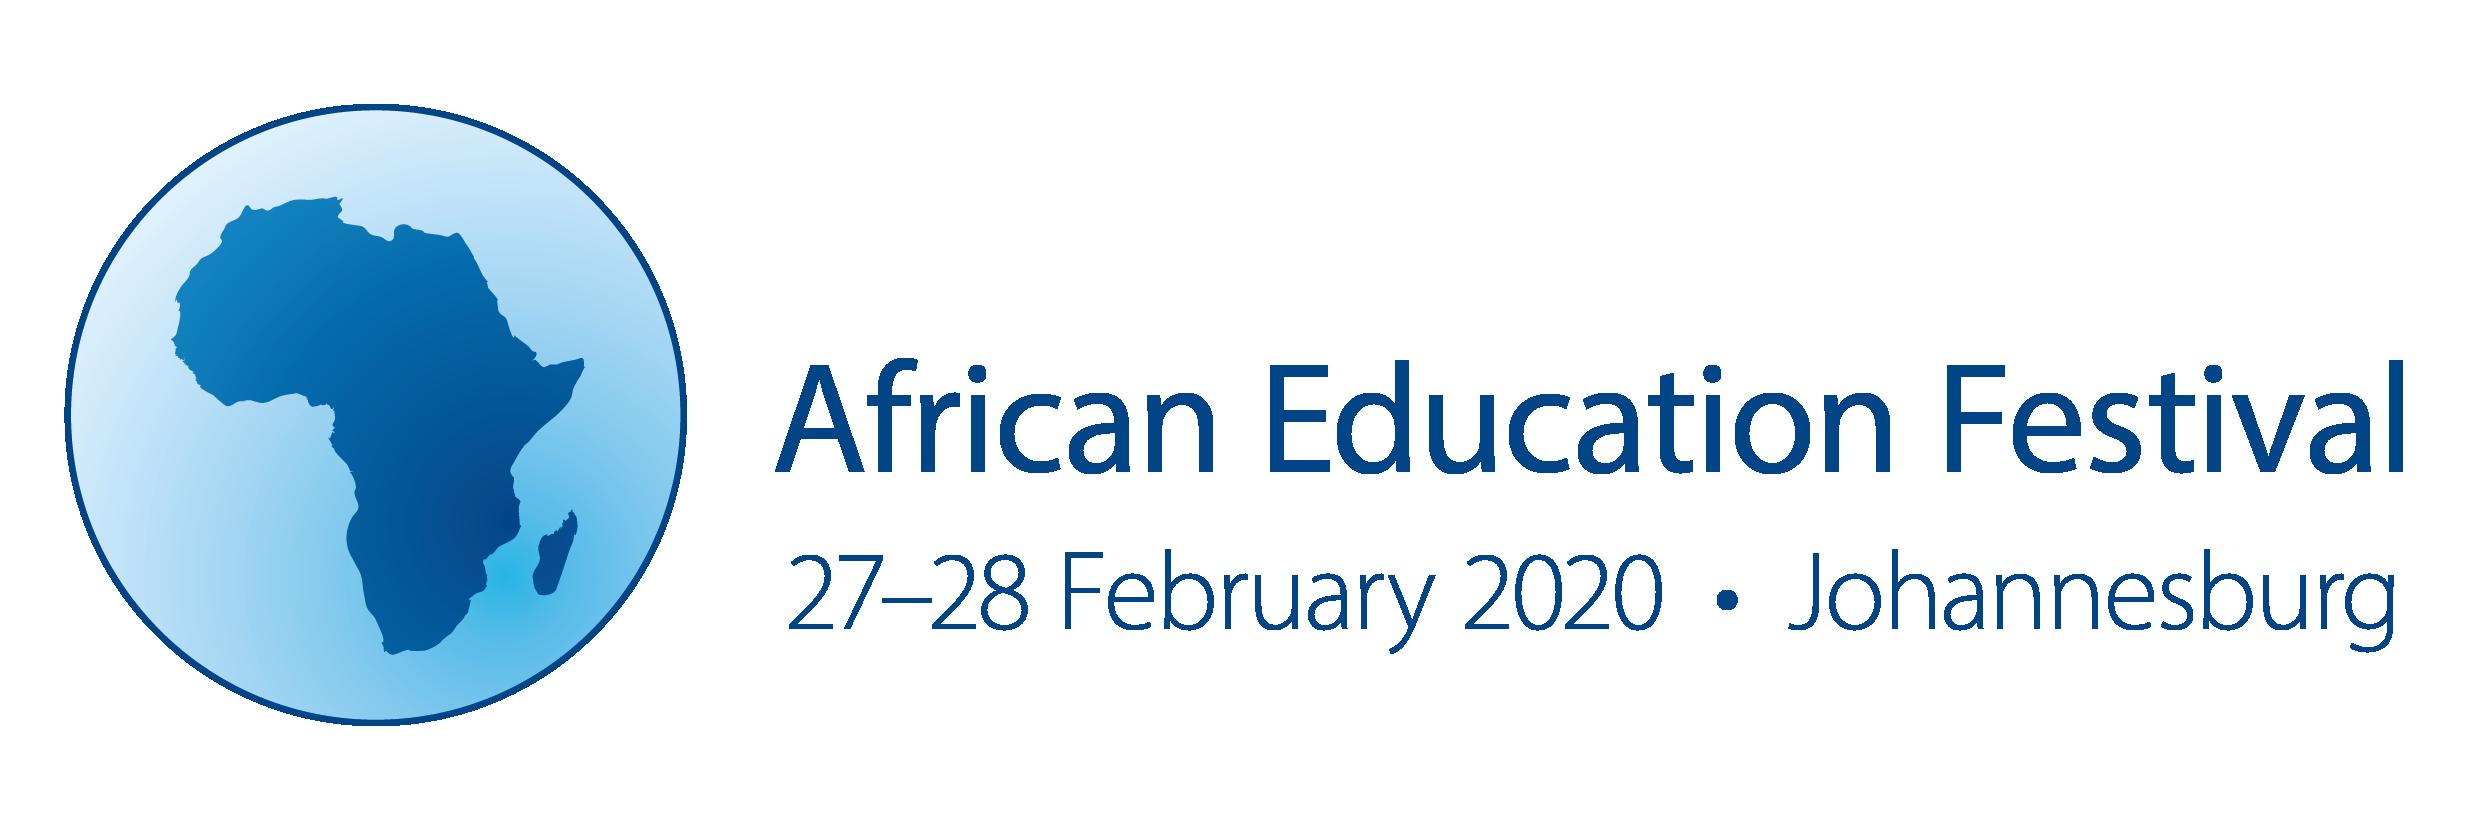 African Education Festival Johannesburg 2020